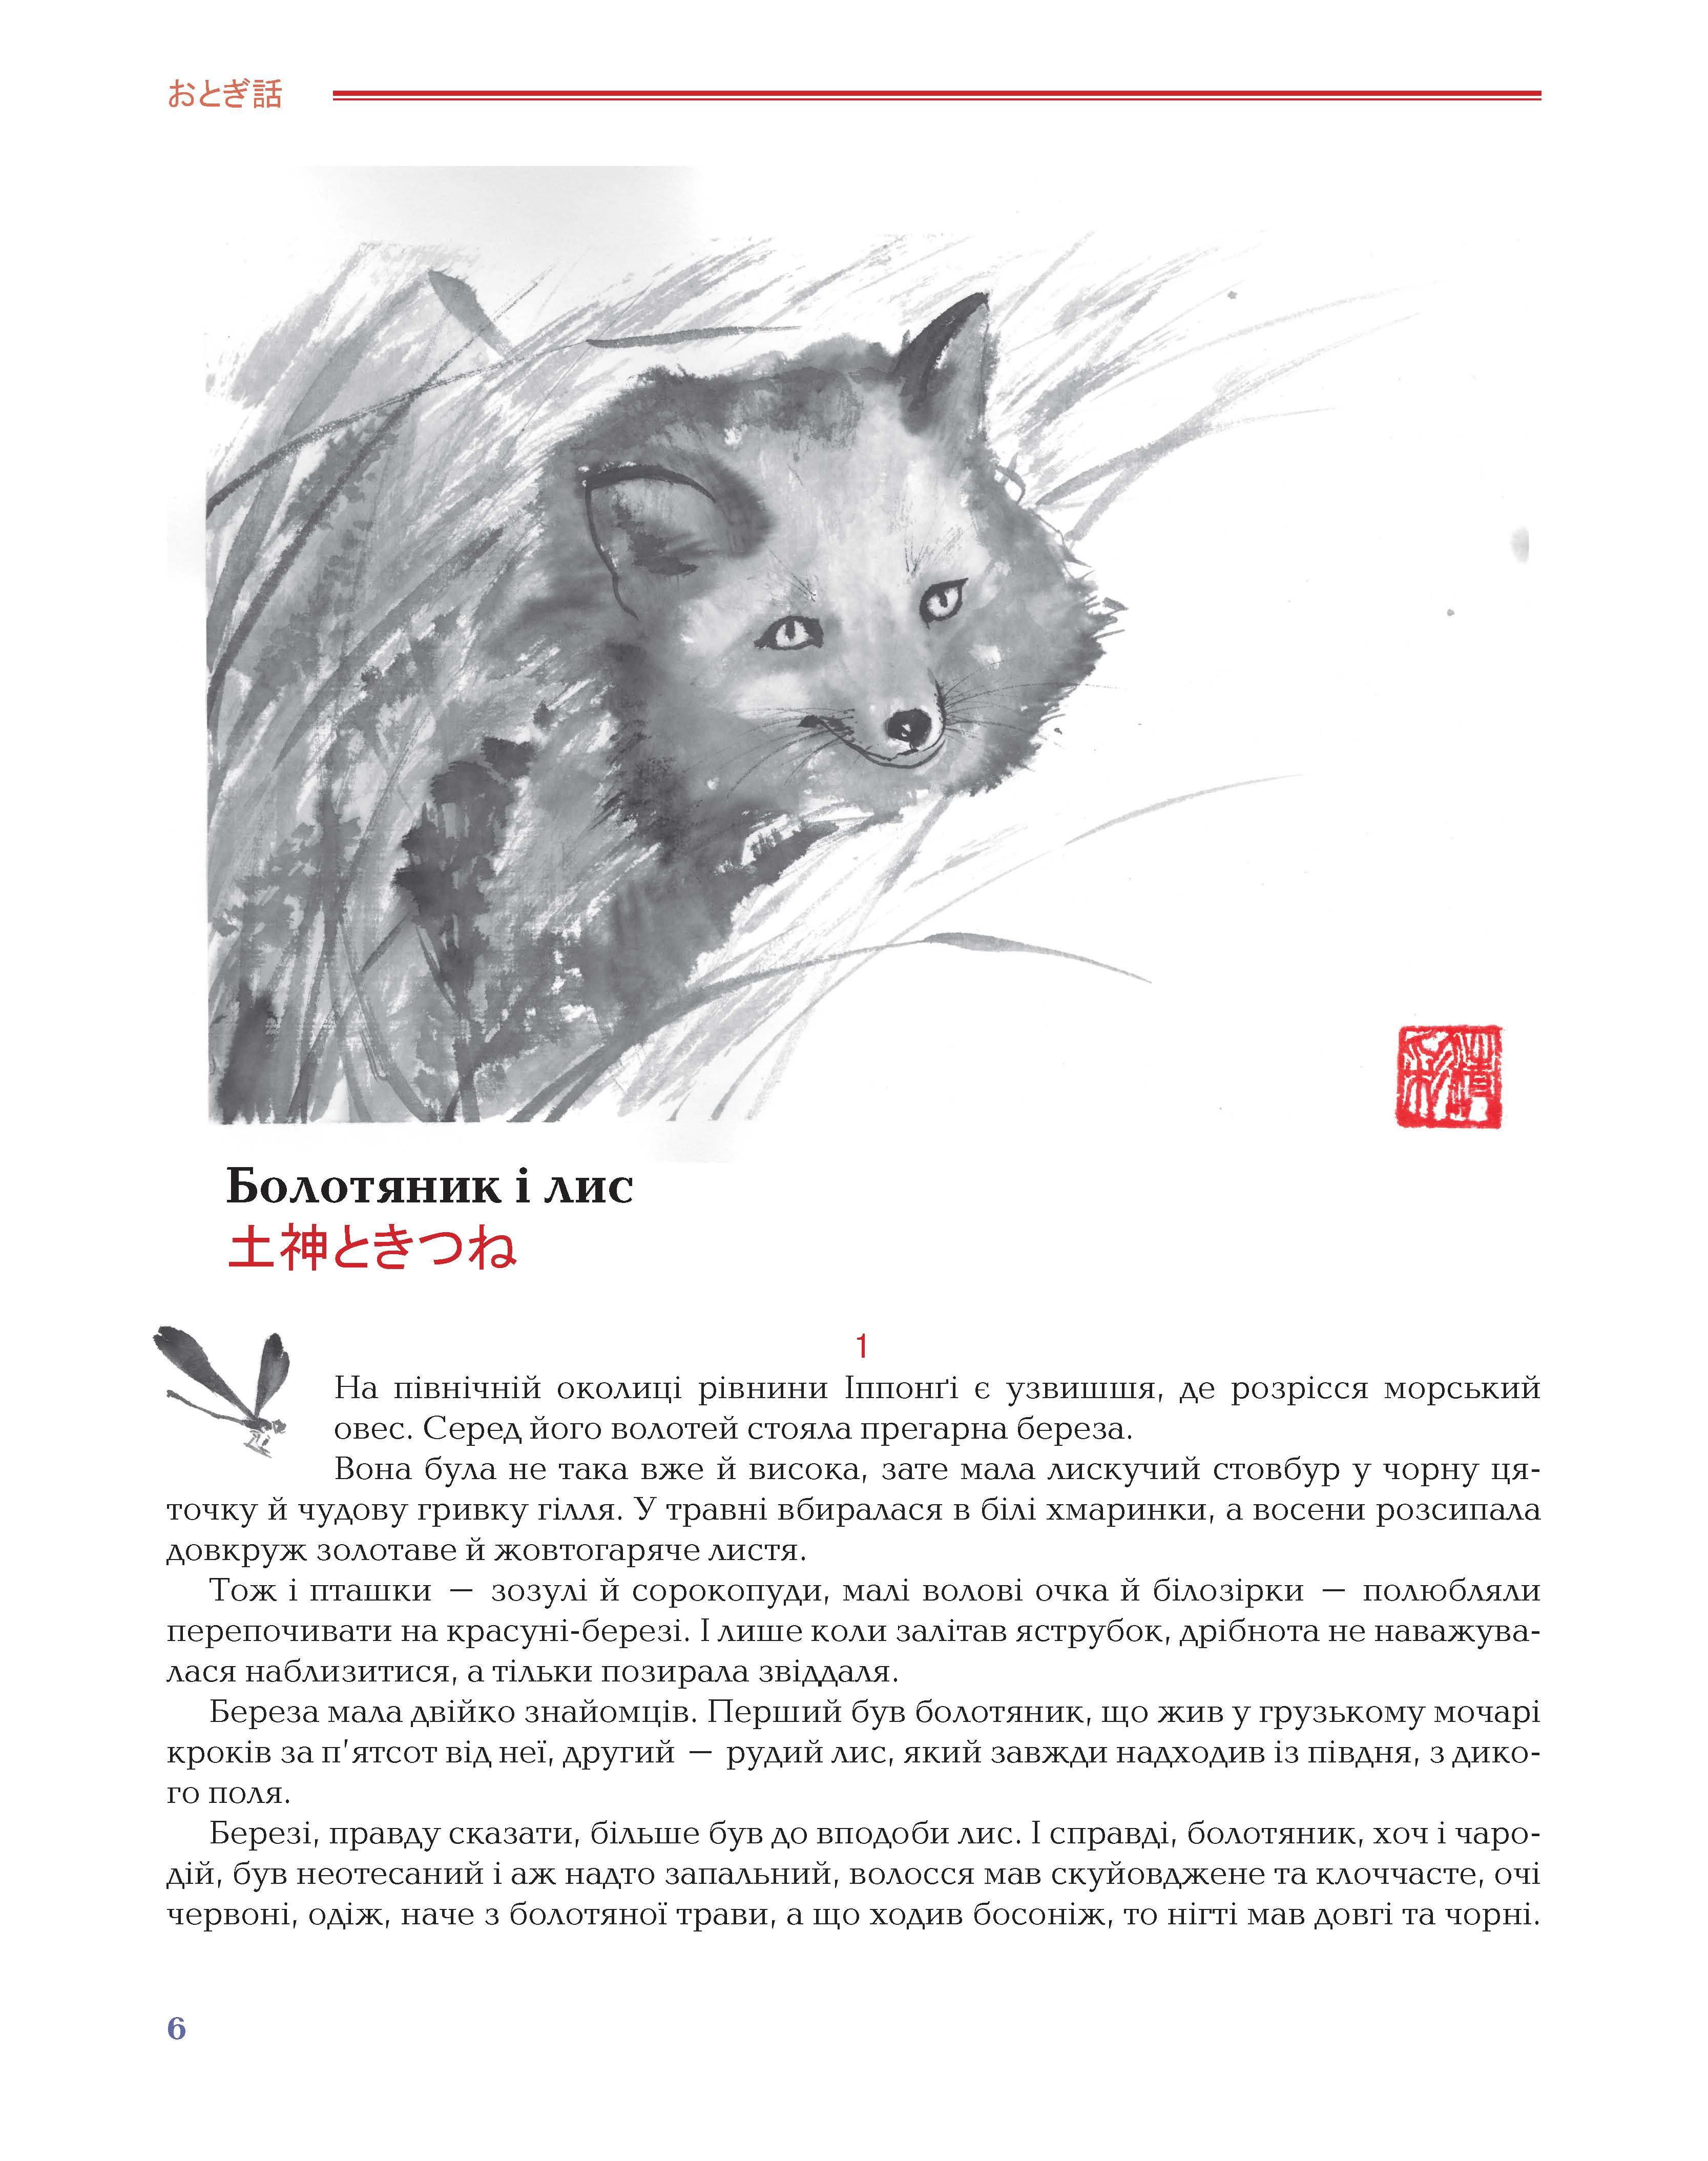 Kazky-CMYK-18-08-End 6